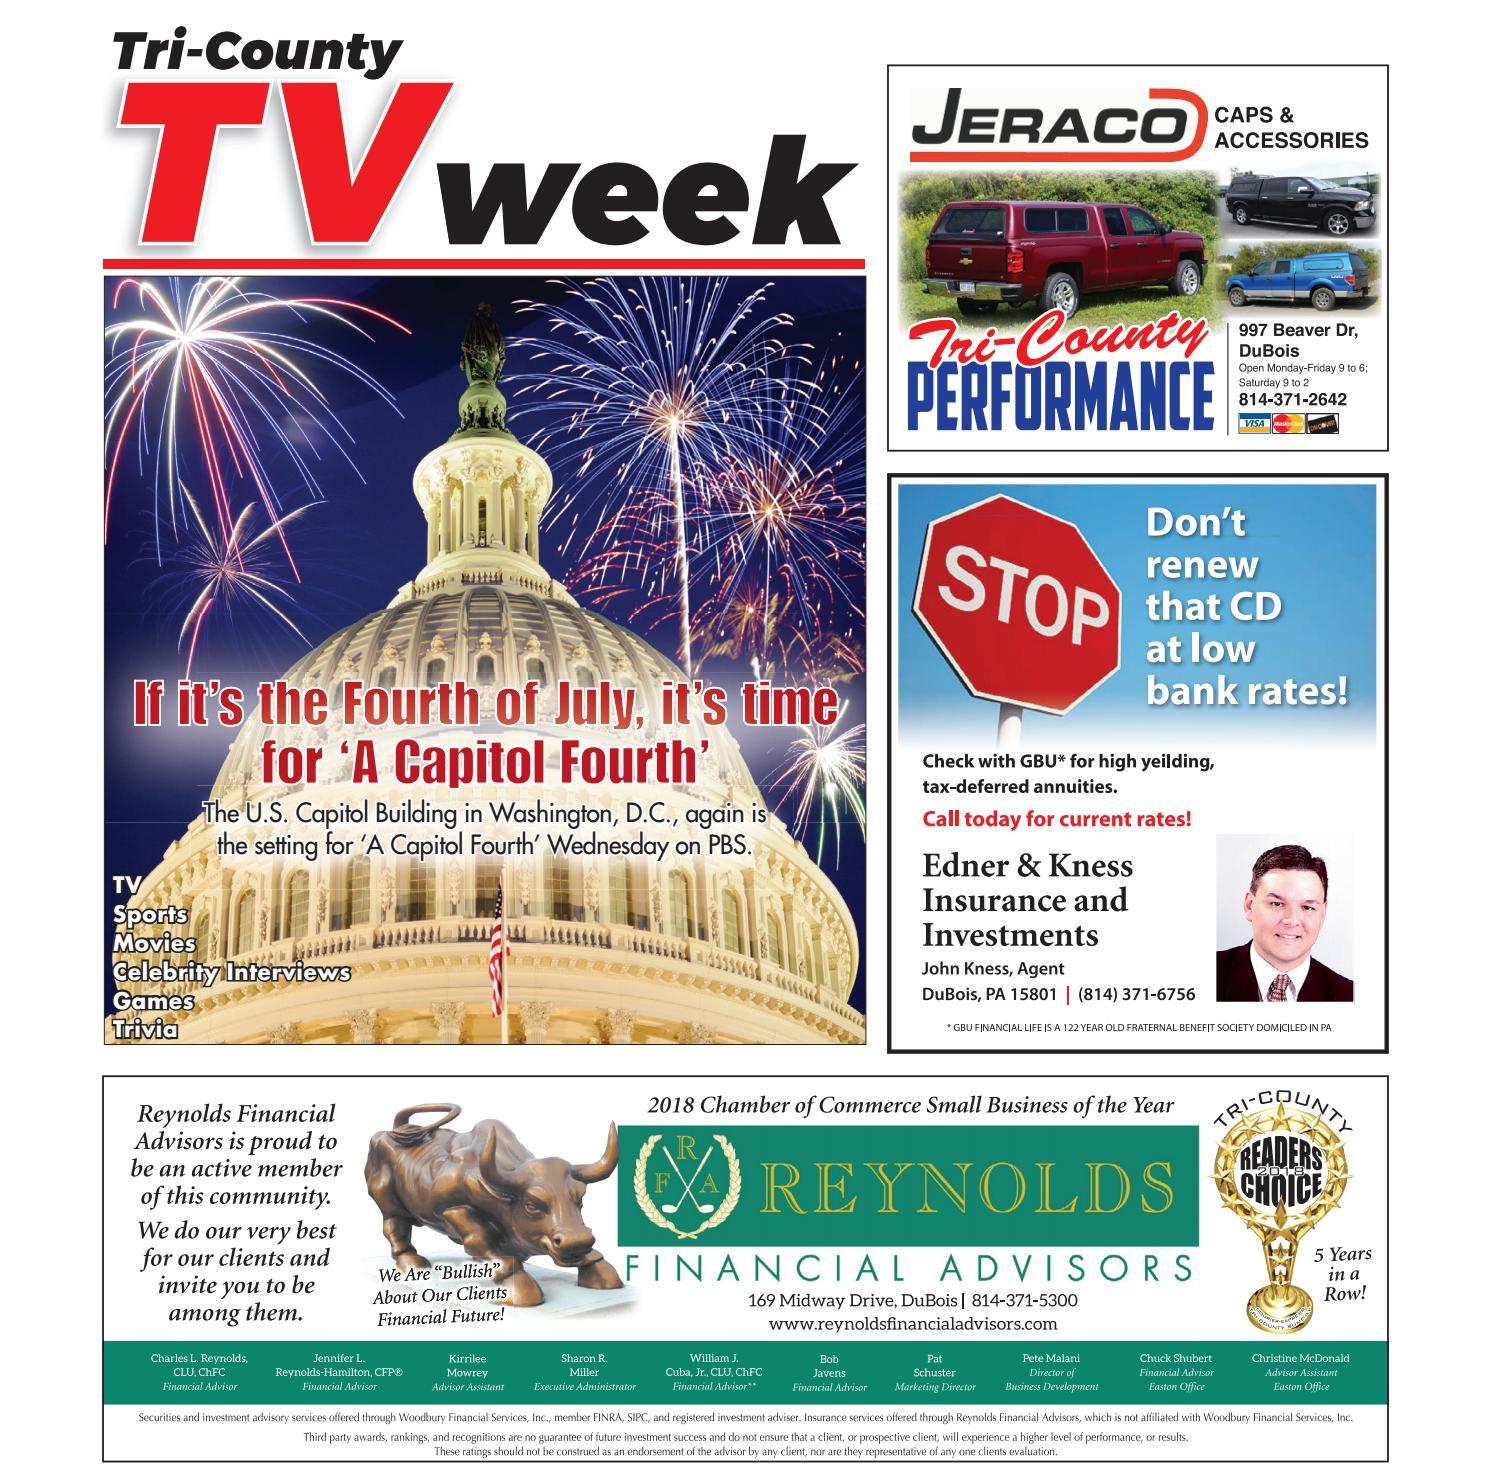 TV Week Friday, June 29, 2018 by Tri-County TV Week - issuu